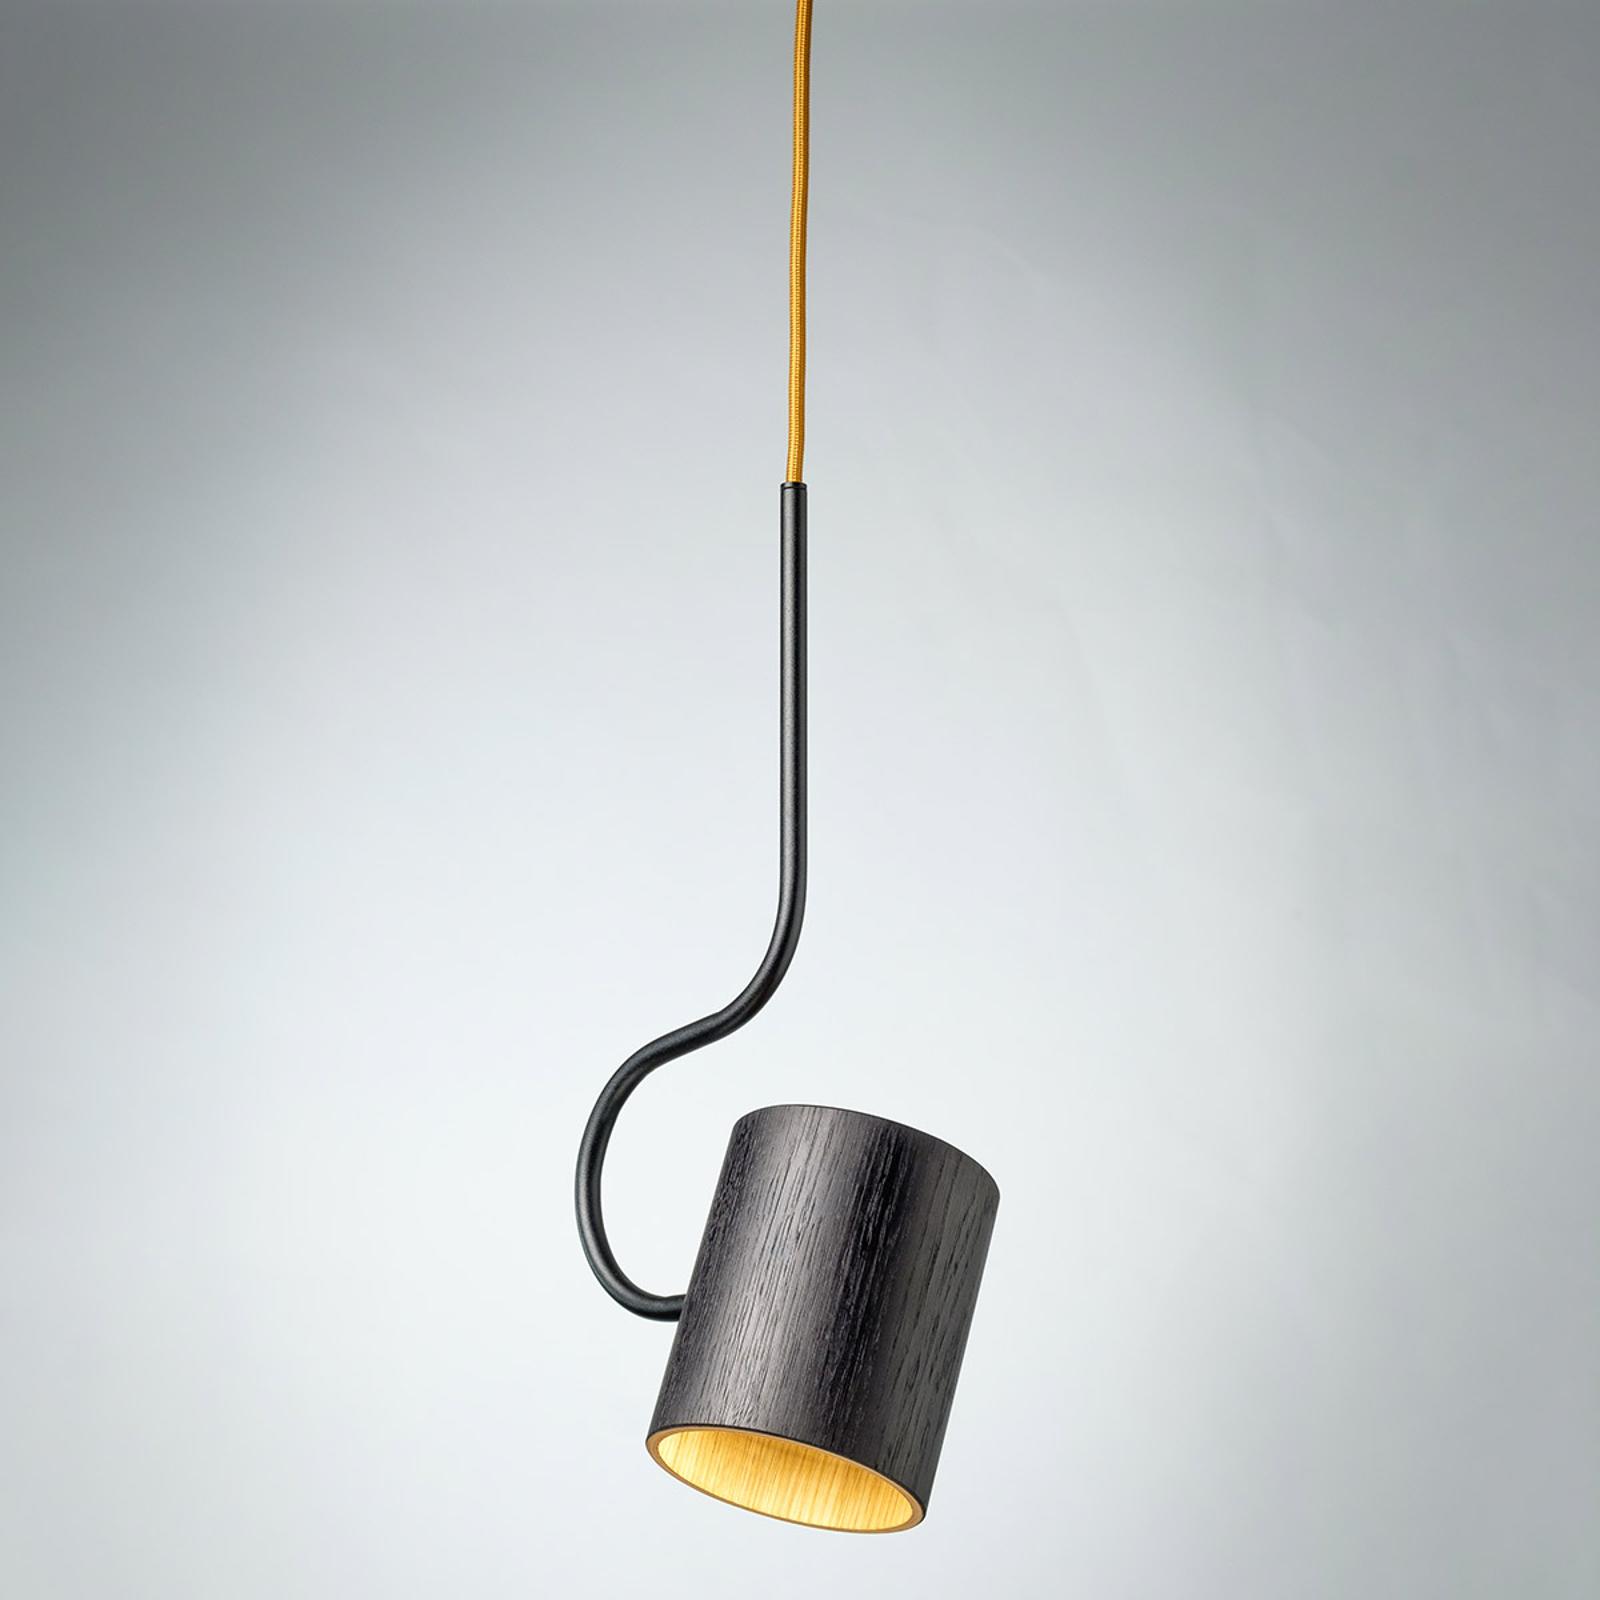 Hanglamp Bocal met houten kap